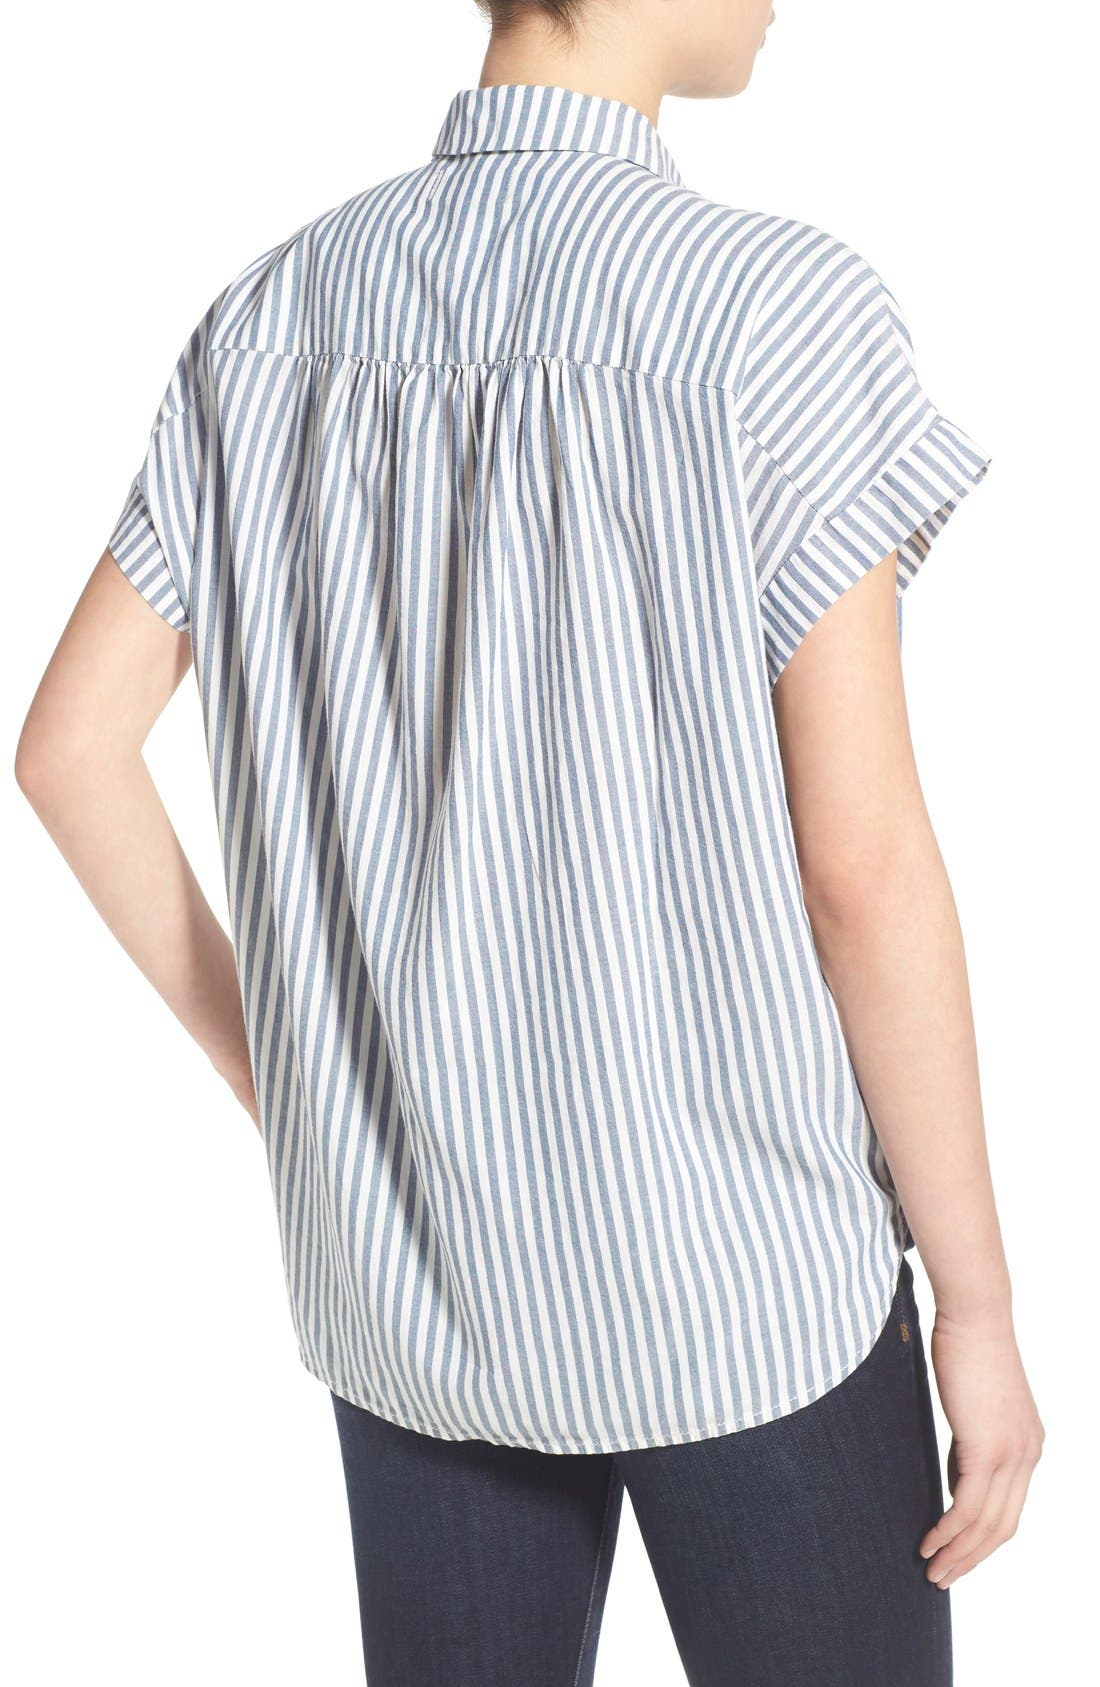 'Central' Stripe Cotton Shirt,                             Alternate thumbnail 2, color,                             Chambray Stripe